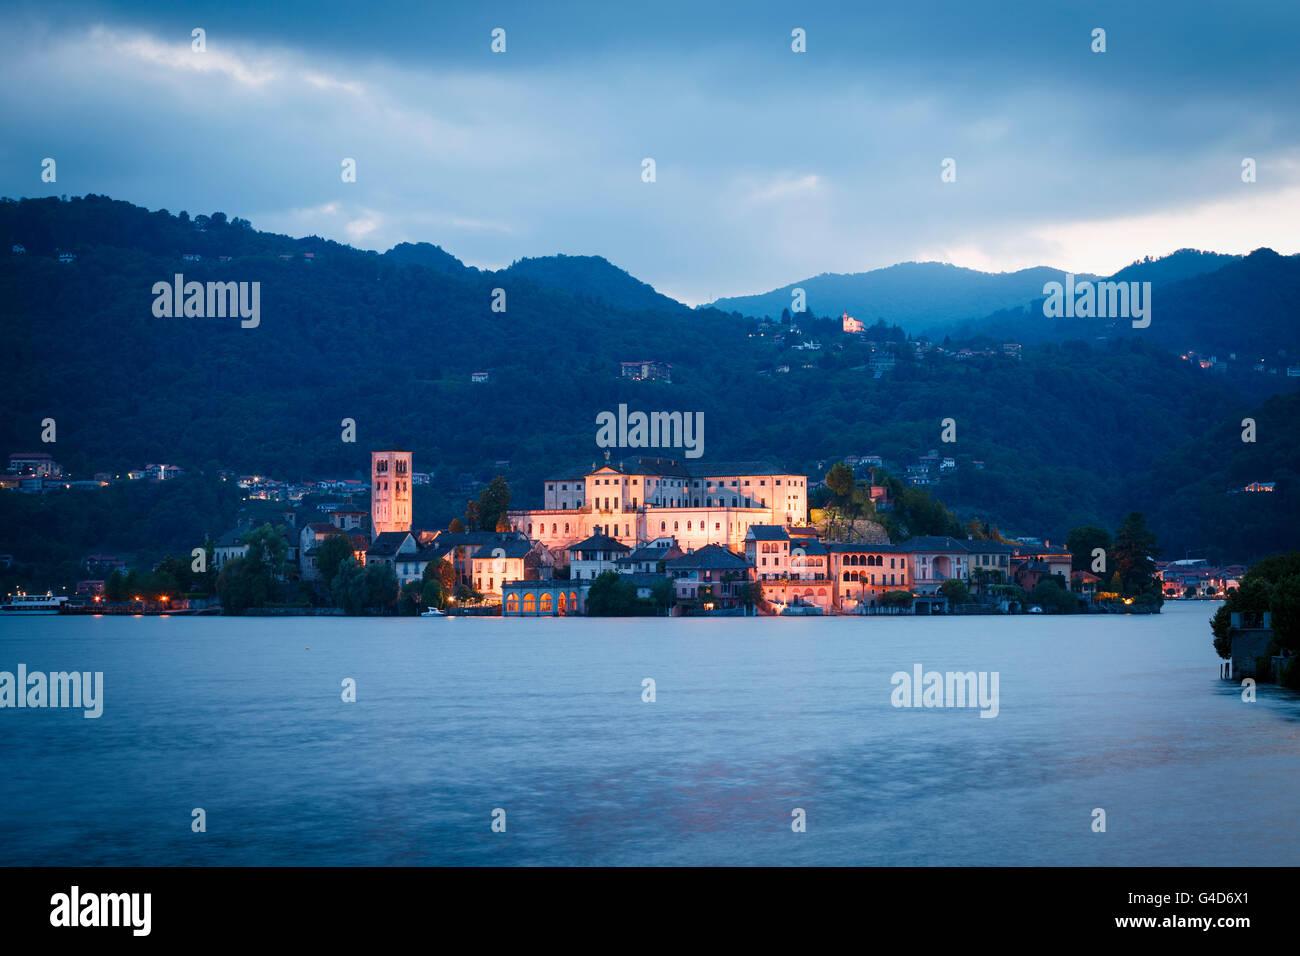 Benedictine Abbey Mater Ecclesiae on the San Giulio island on Lake Orta, Orta San Giulio, Piedmont, Italy. Stock Photo